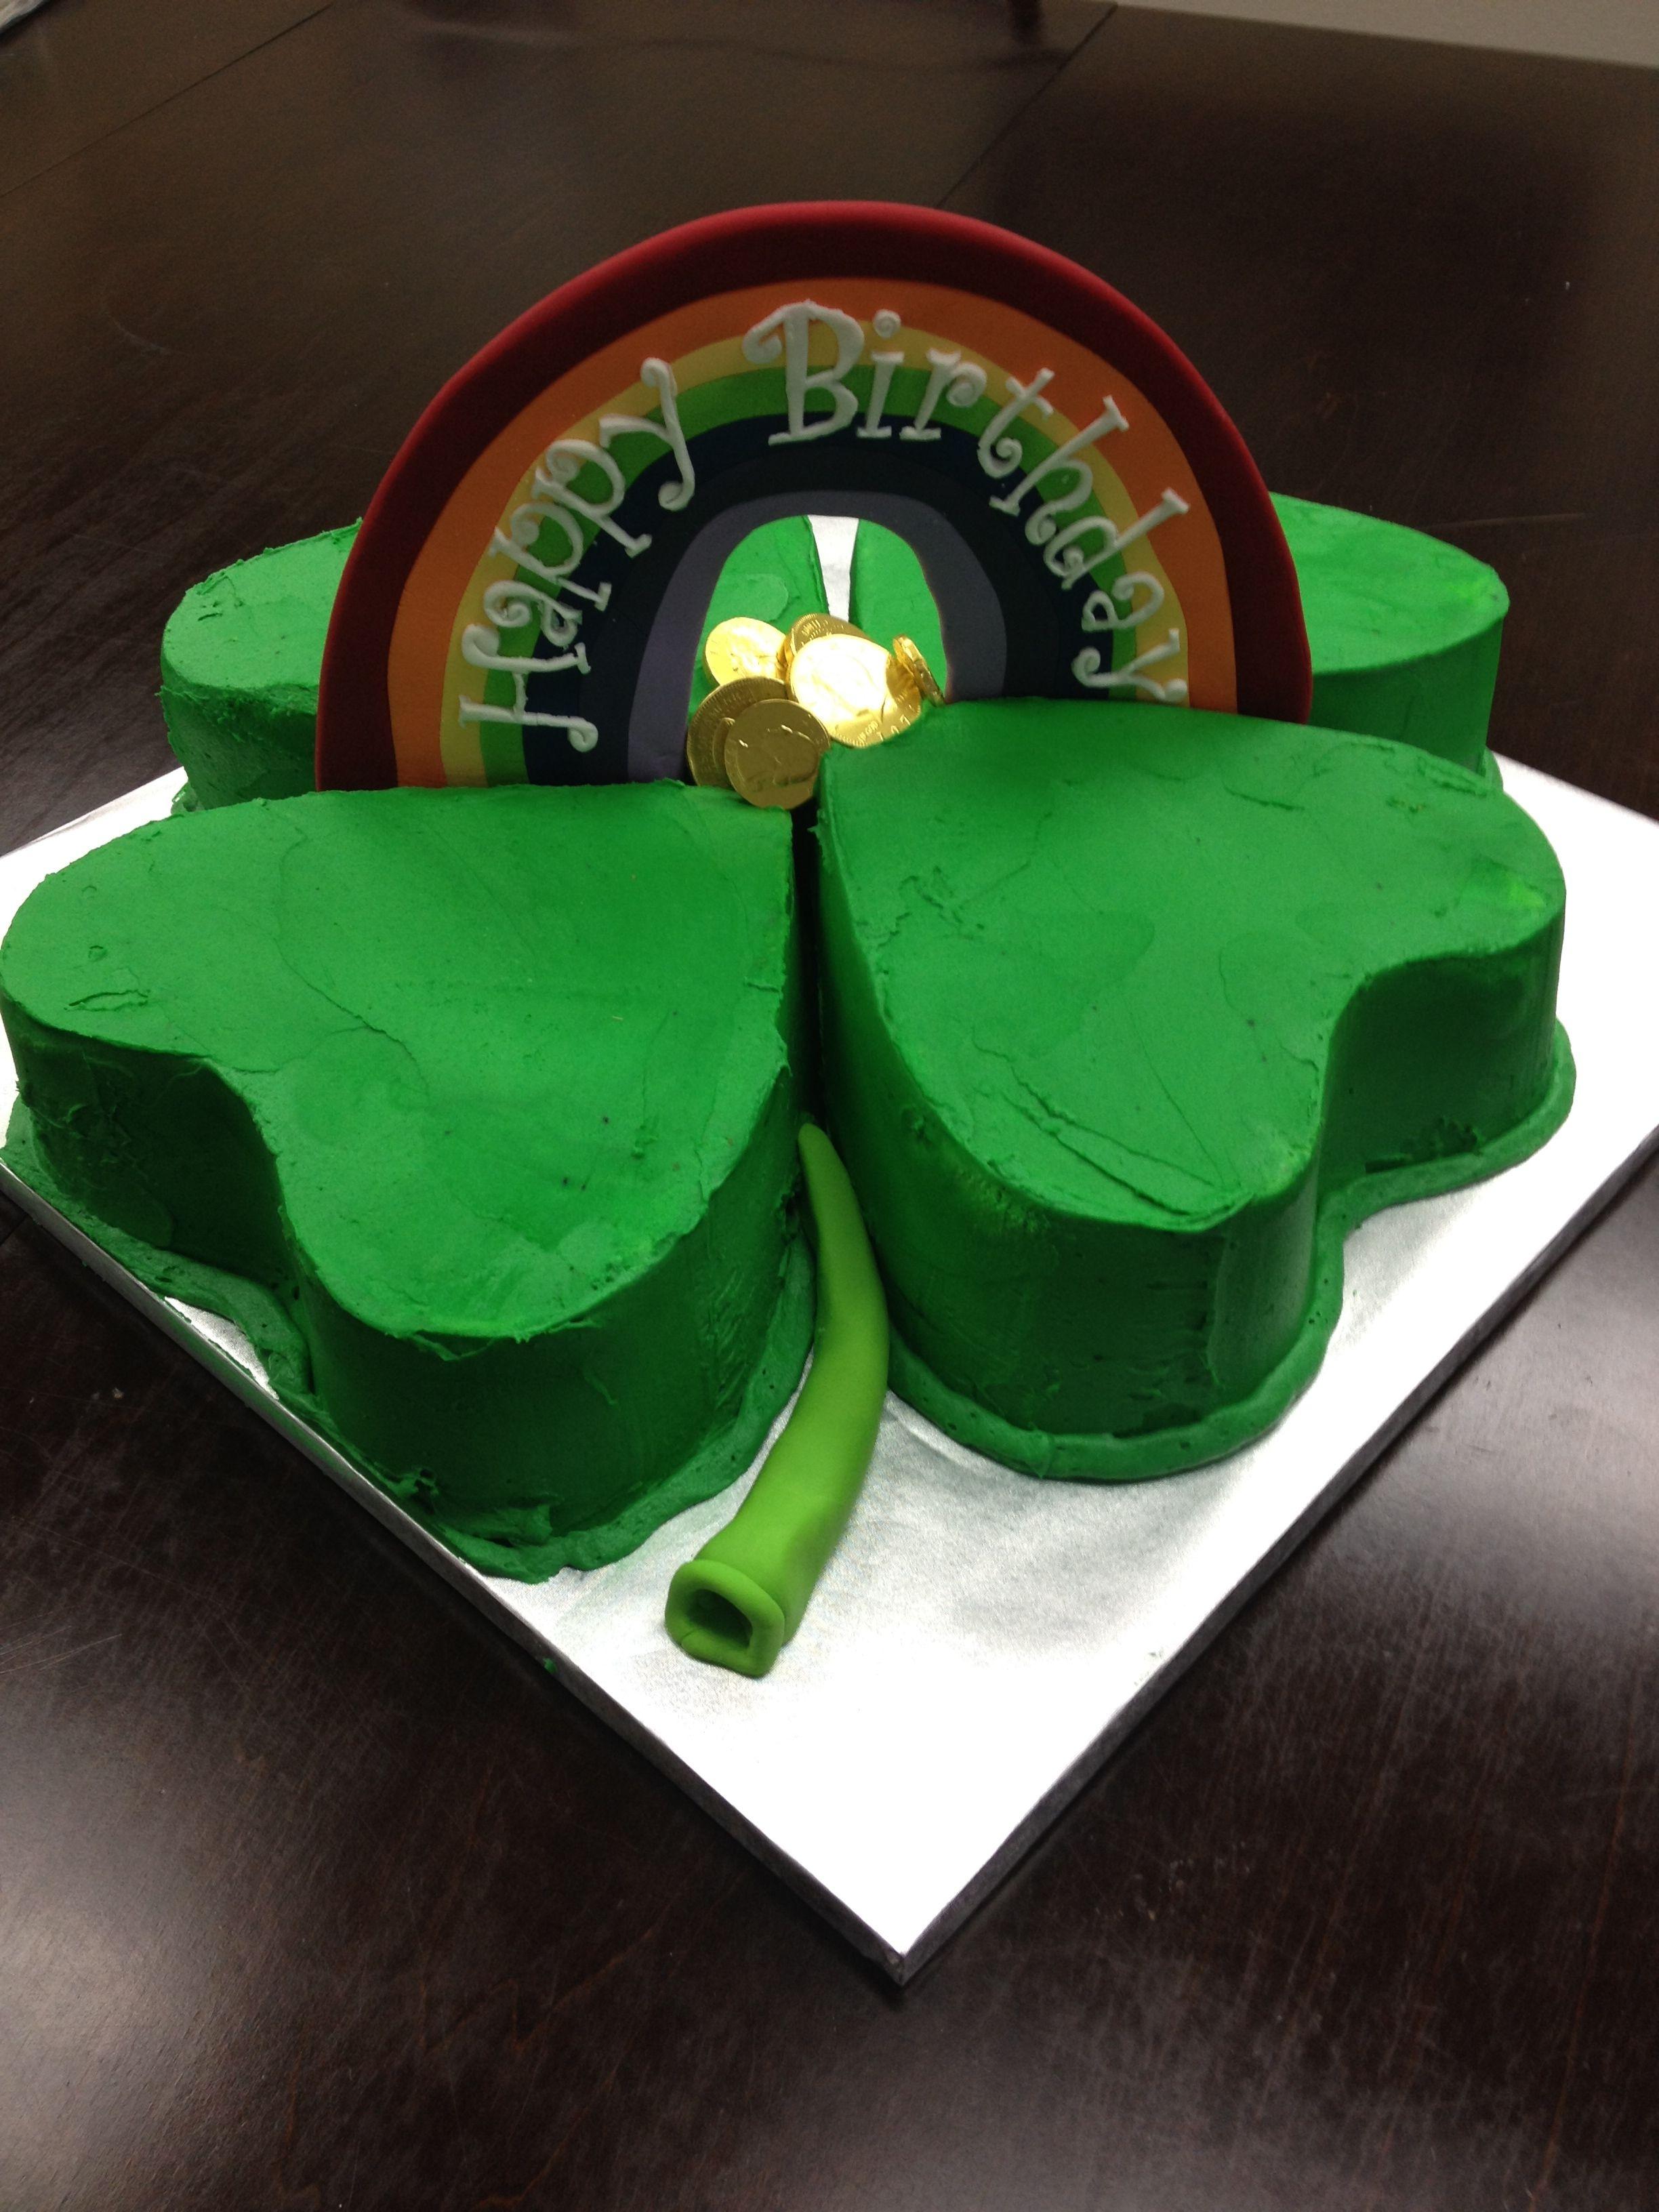 Surprising Shamrock Birthday Cake Special Occasion Cakes Occasion Cakes Birthday Cards Printable Trancafe Filternl